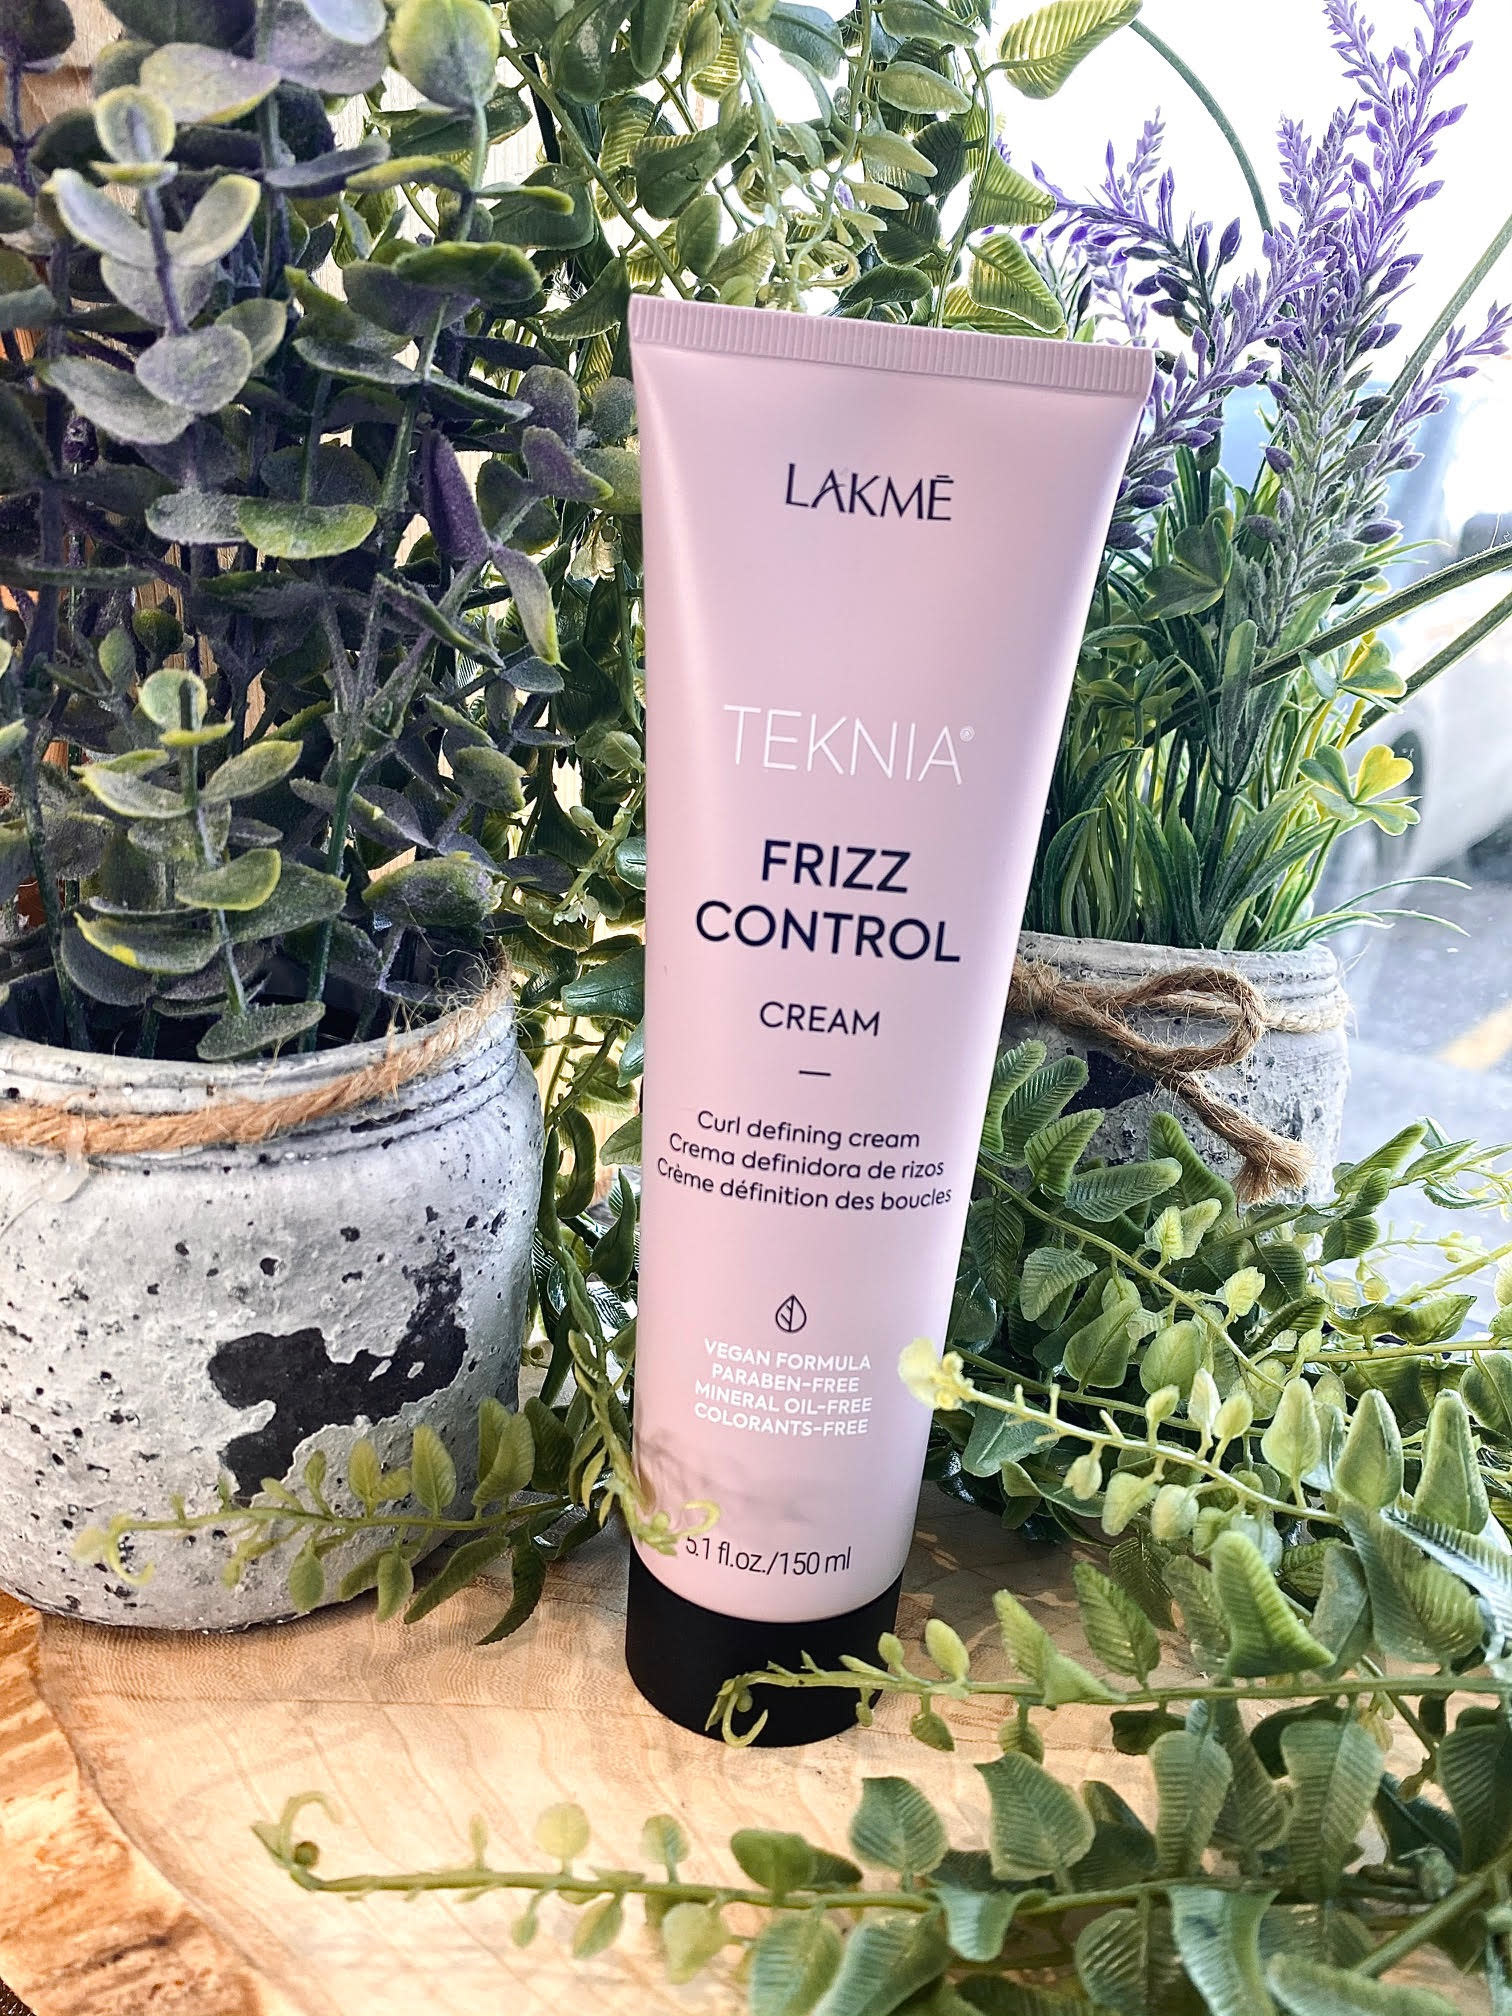 Lakmé  TEKNIA frizz control cream 150ml